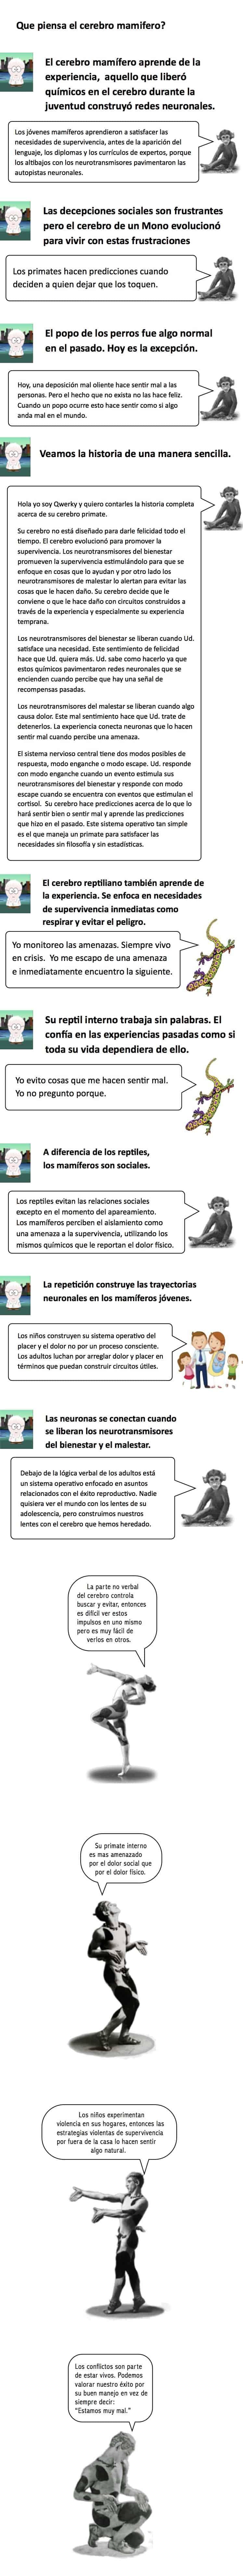 cartoons long espanol